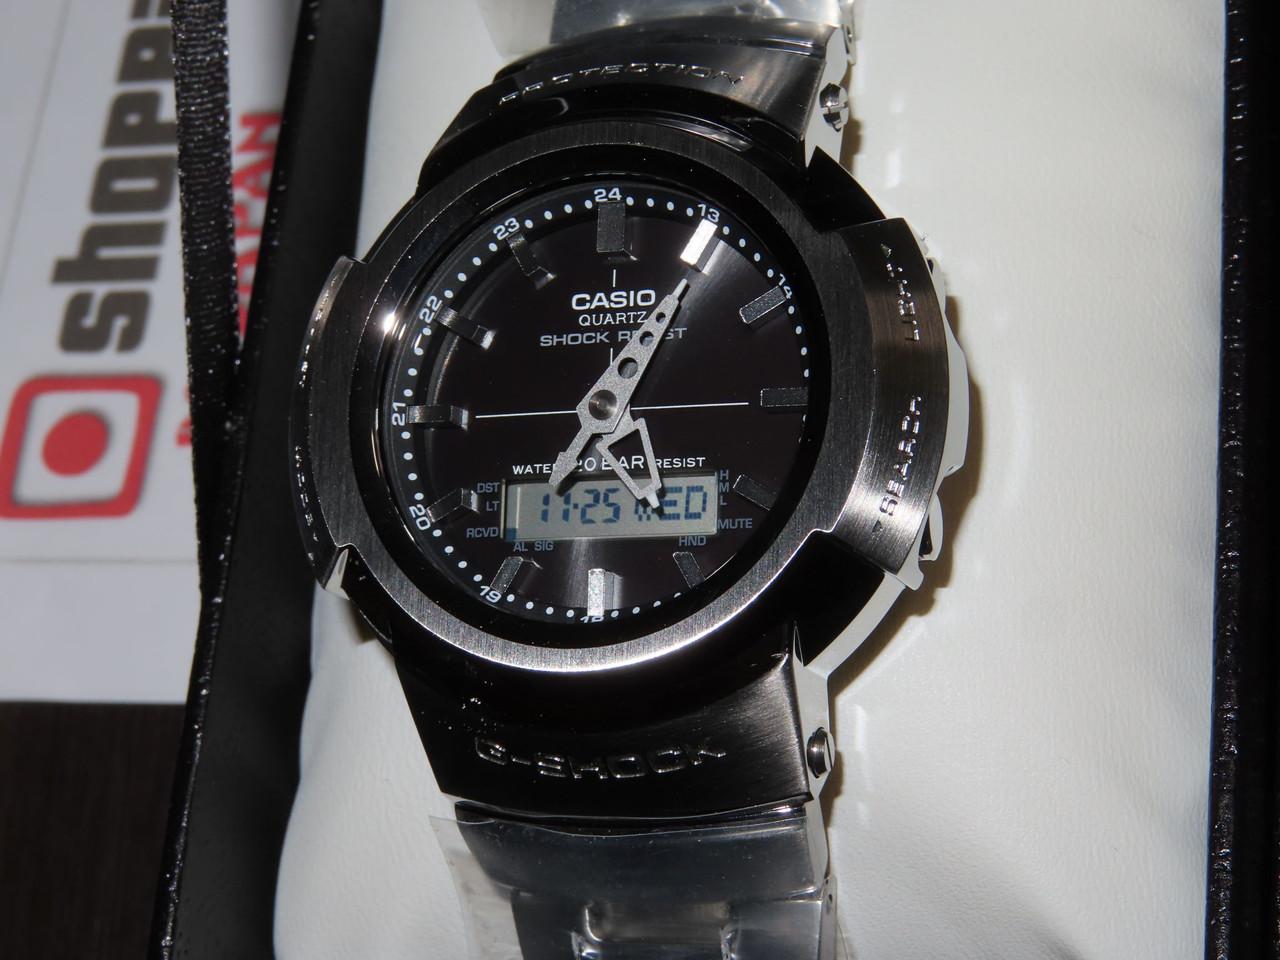 G-Shock Full Metal Screw-Back Edition AWM-500D-1AJF